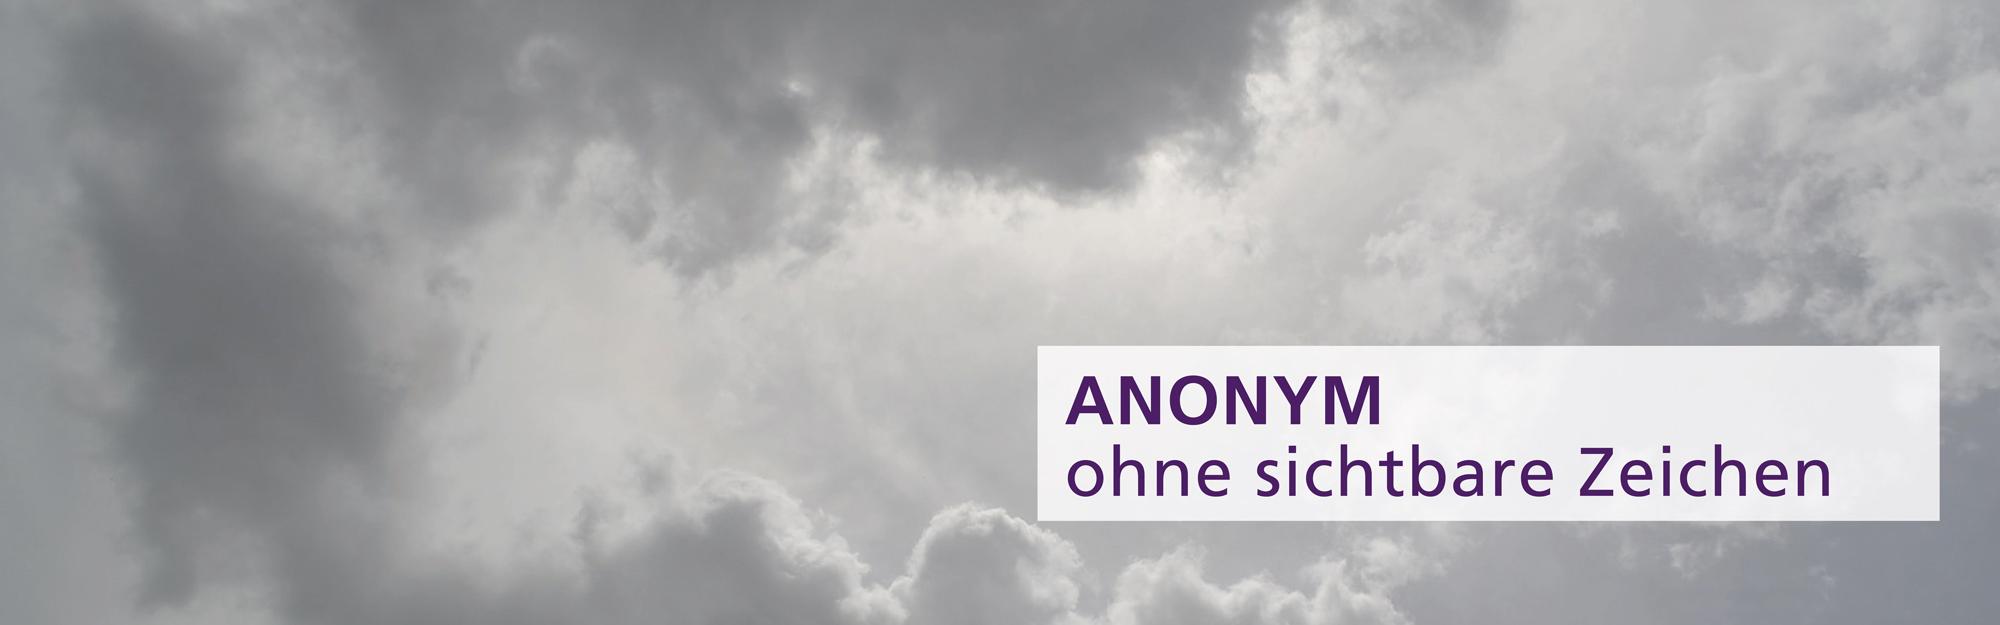 GBI-ANONYM2000_625-1